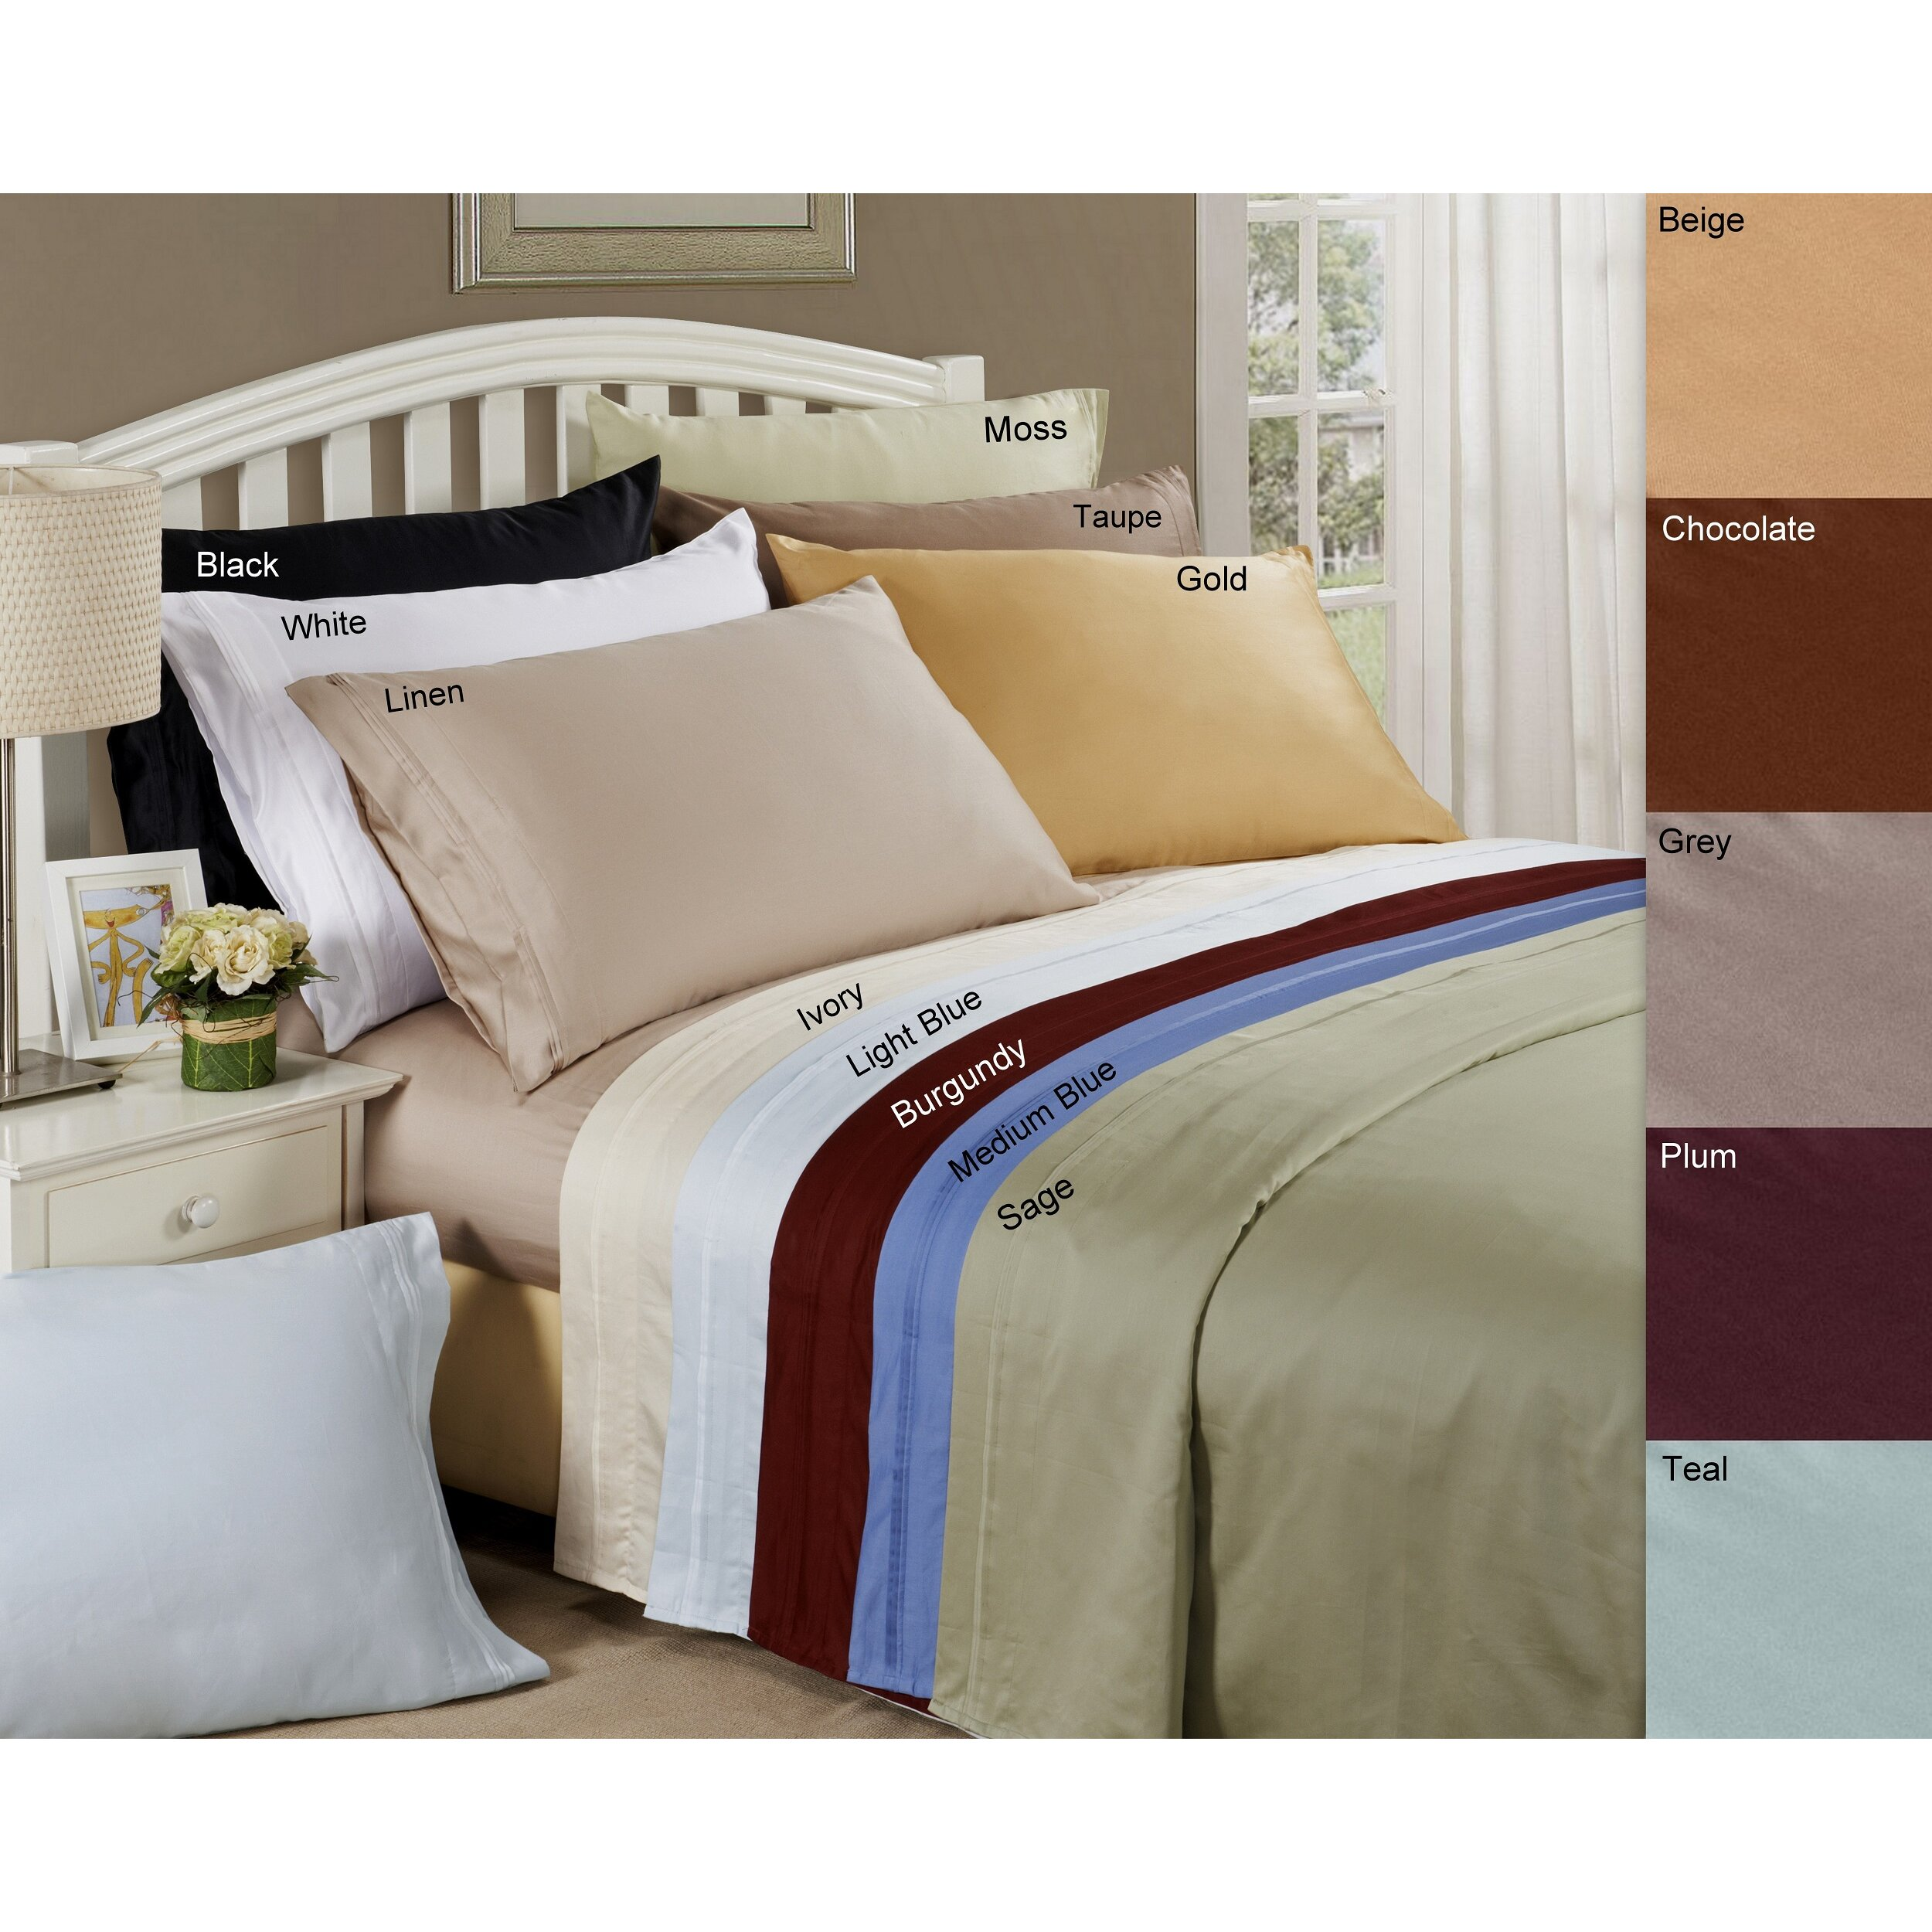 Brayden studio duvet cover collection reviews wayfair for Studio one bed cover